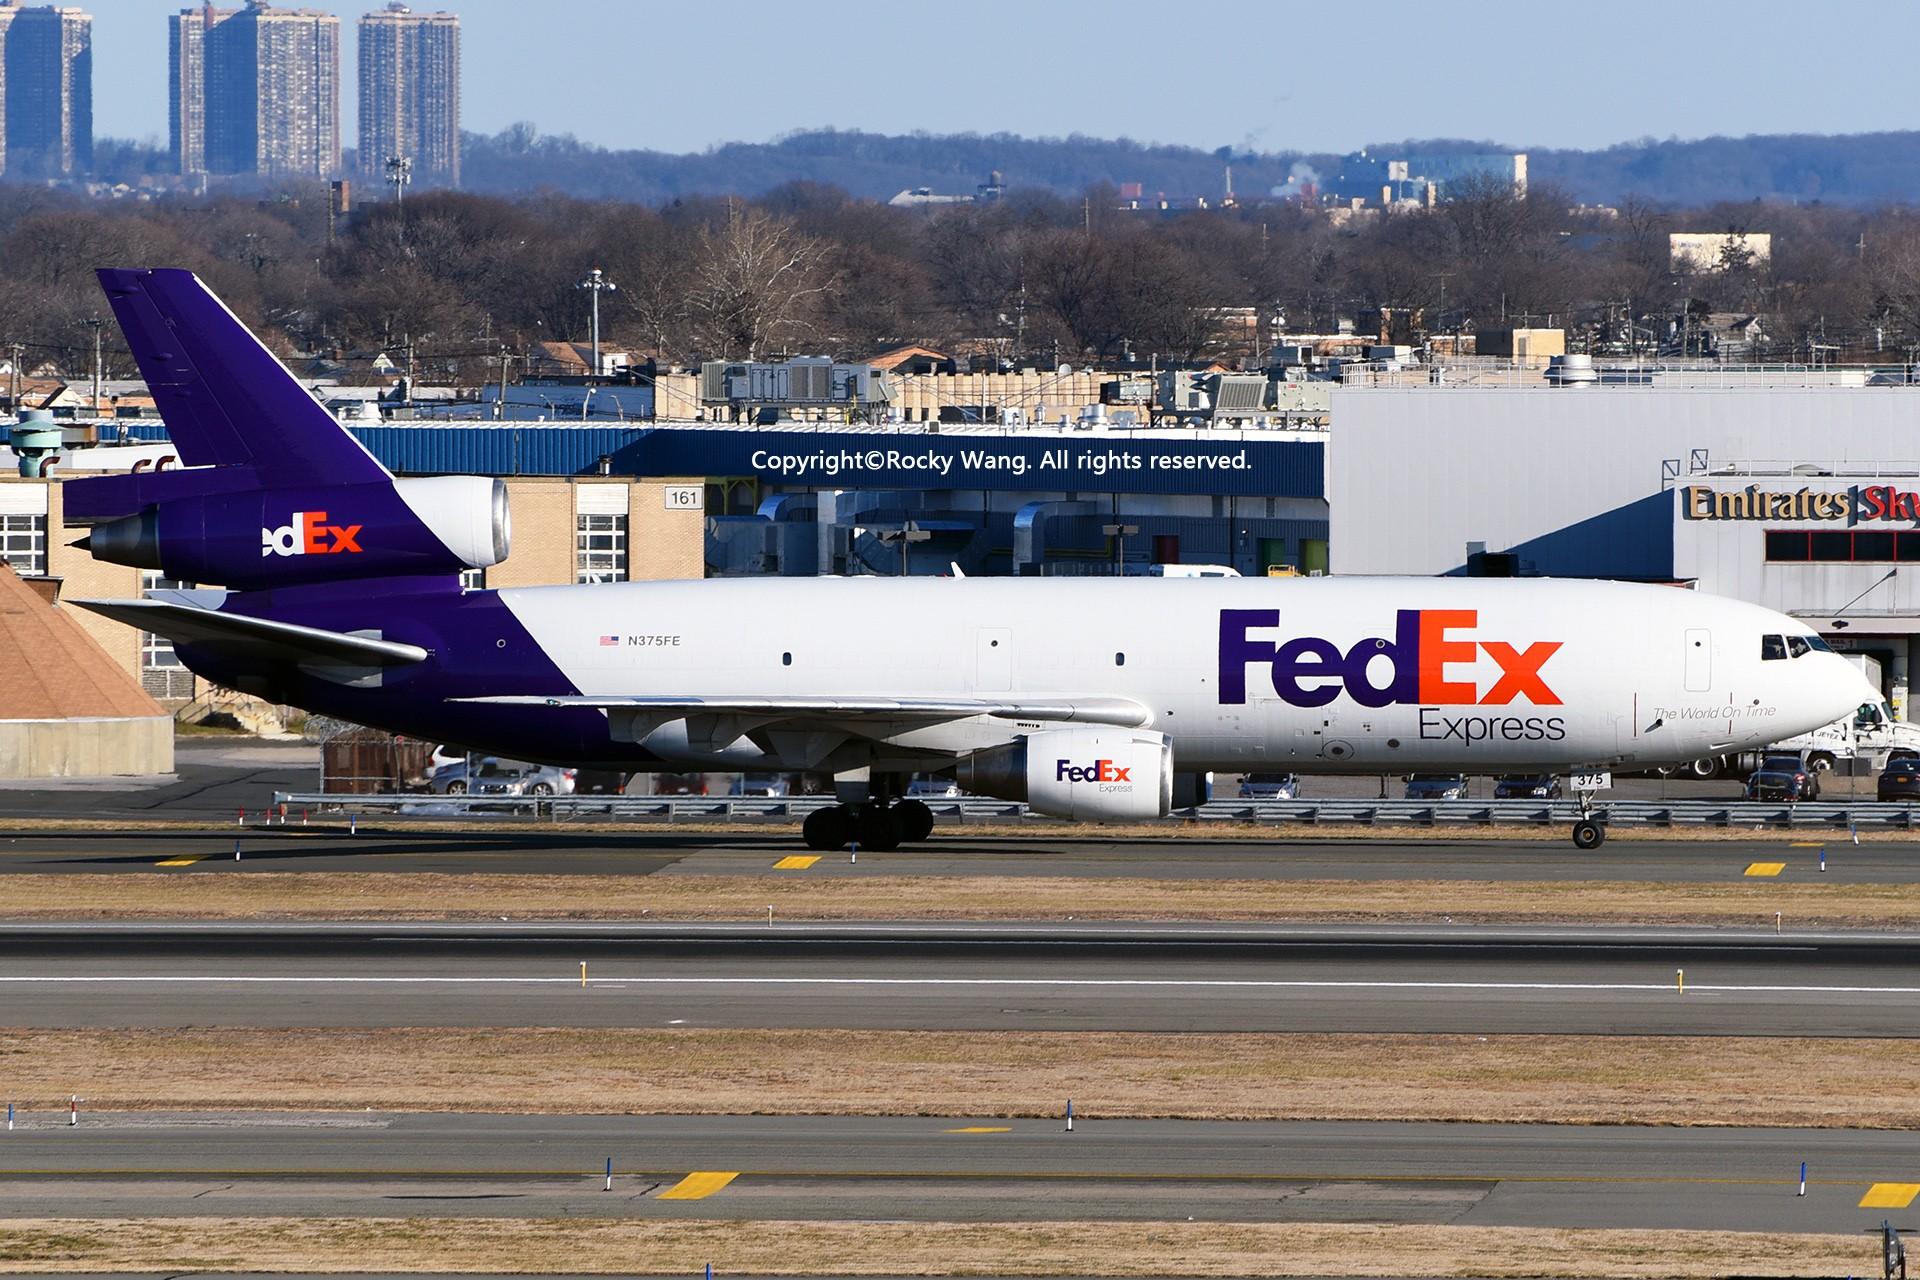 Re:[原创]KJFK 30图 MCDONNELL DOUGLAS MD-10-10(F) N375FE New York John F. Kennedy Int'l Airport